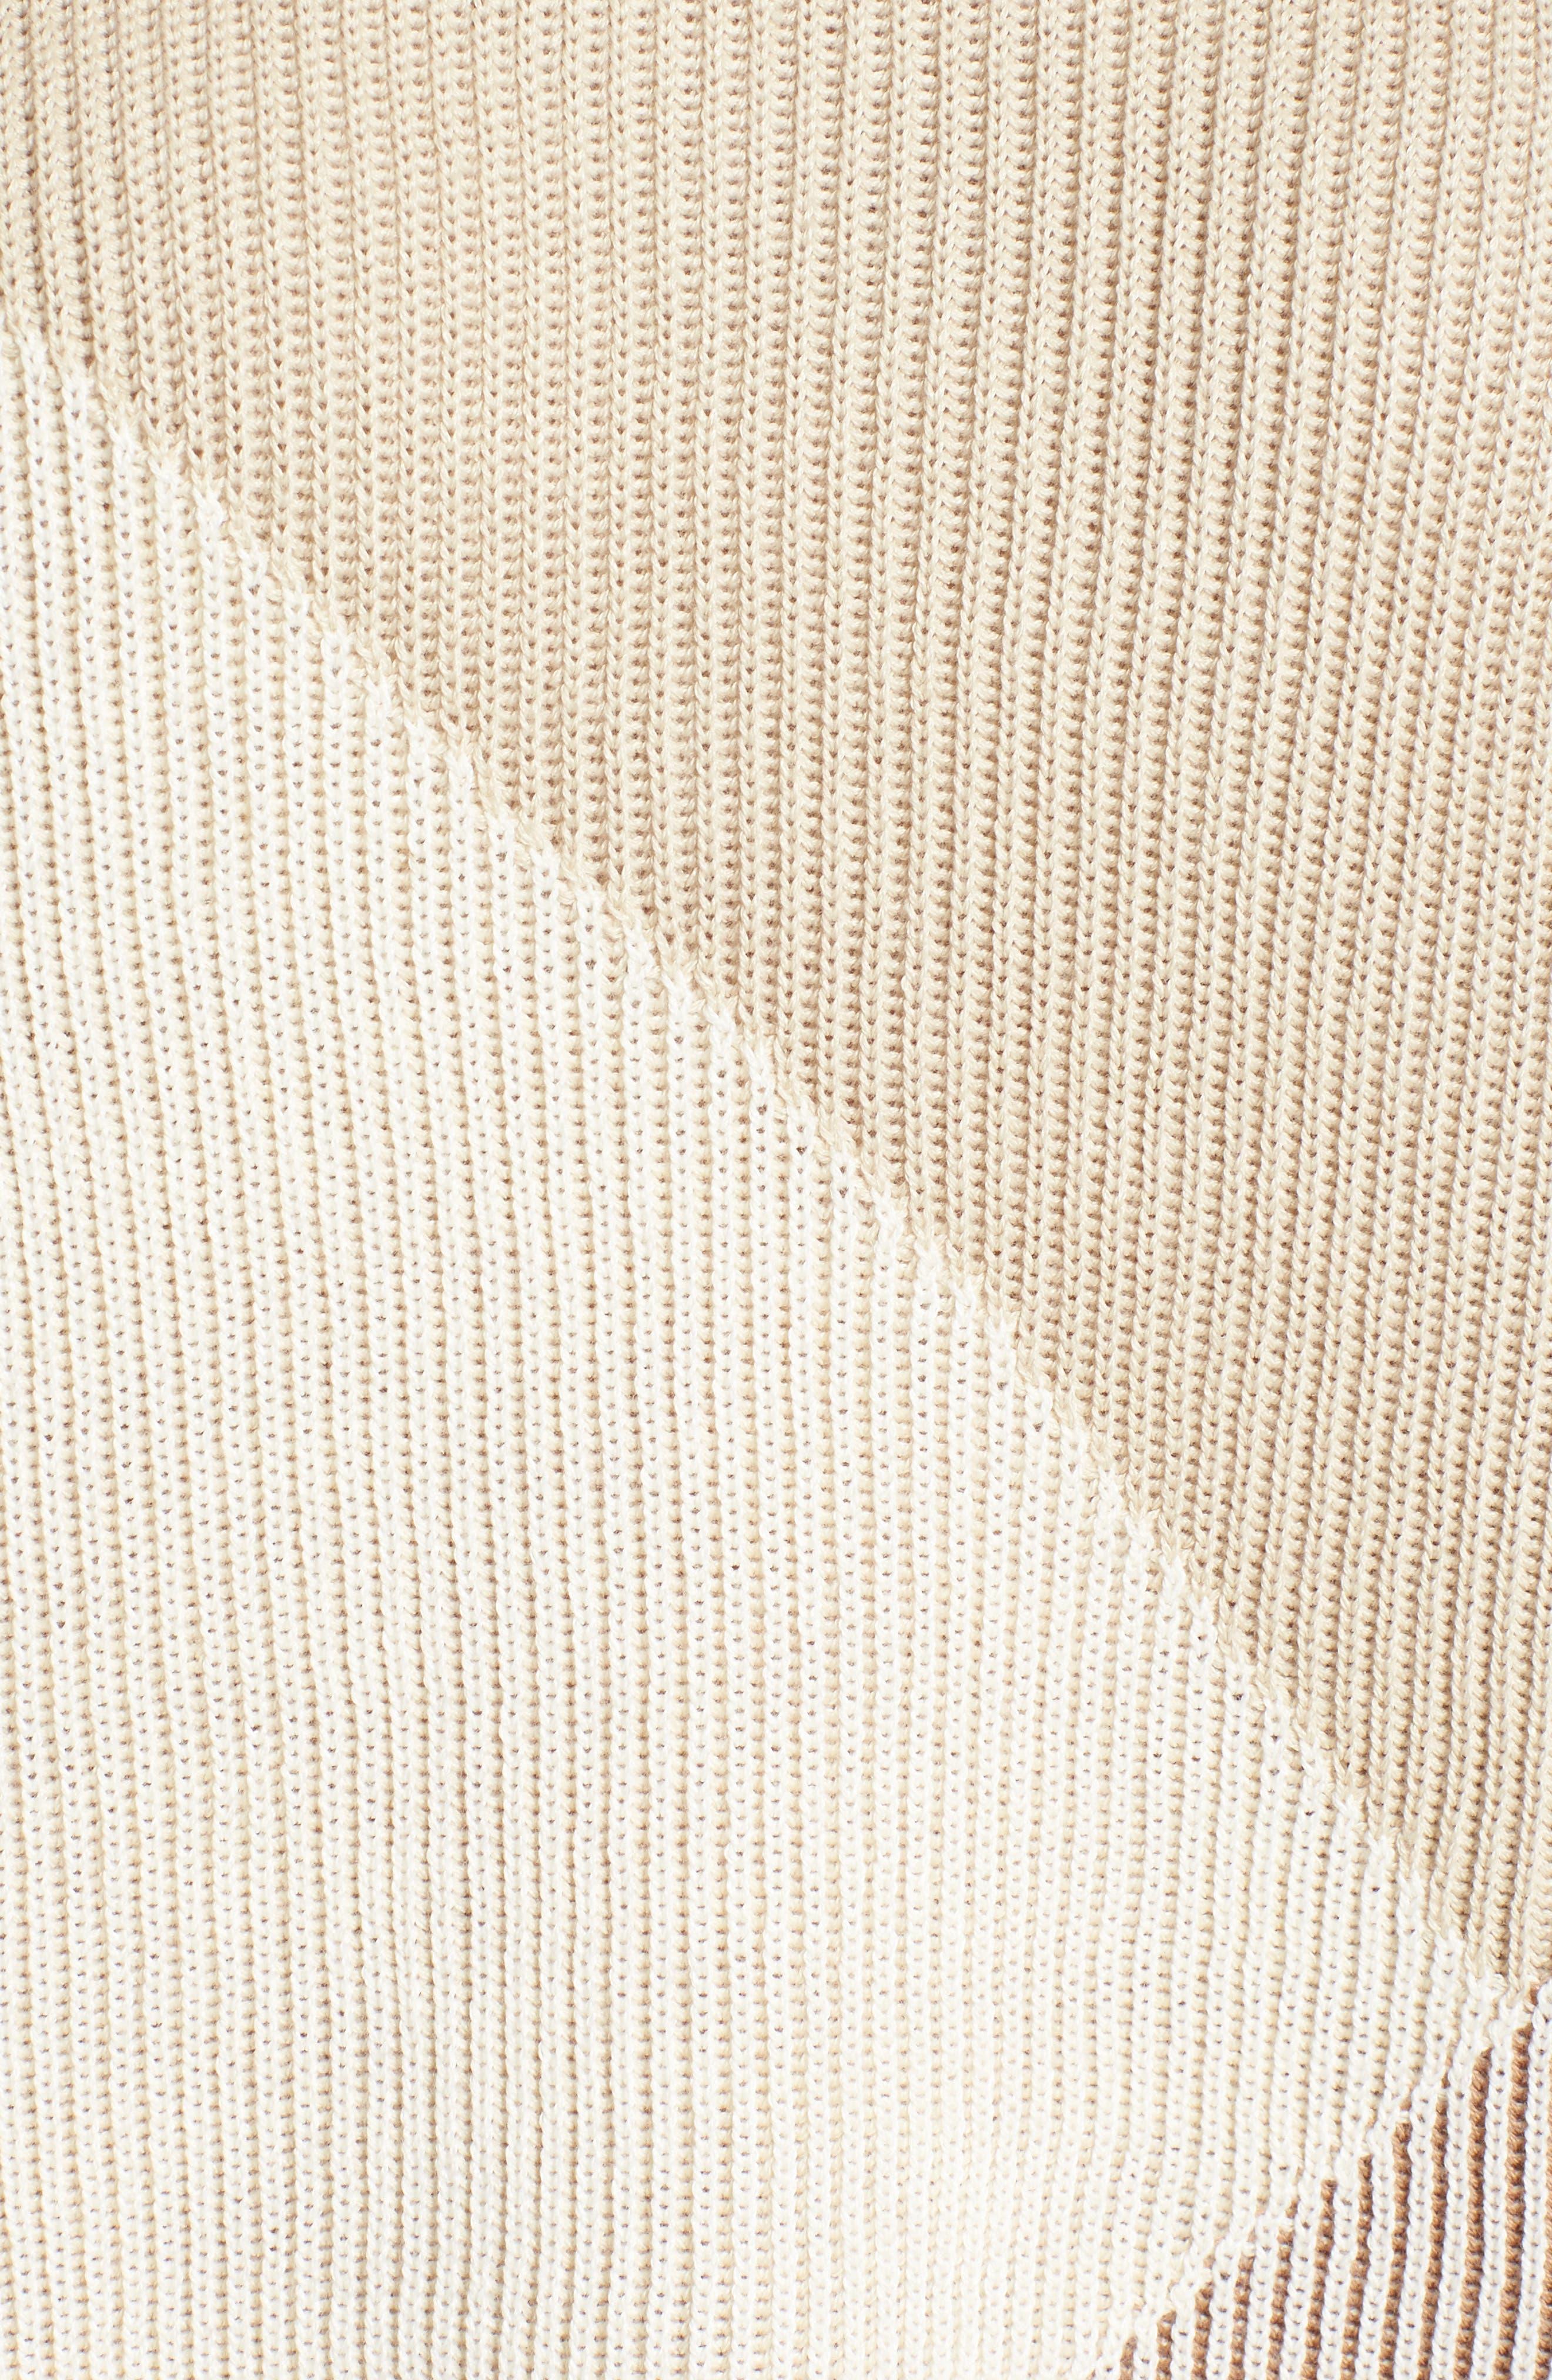 Linear Cozy Top,                             Alternate thumbnail 5, color,                             259